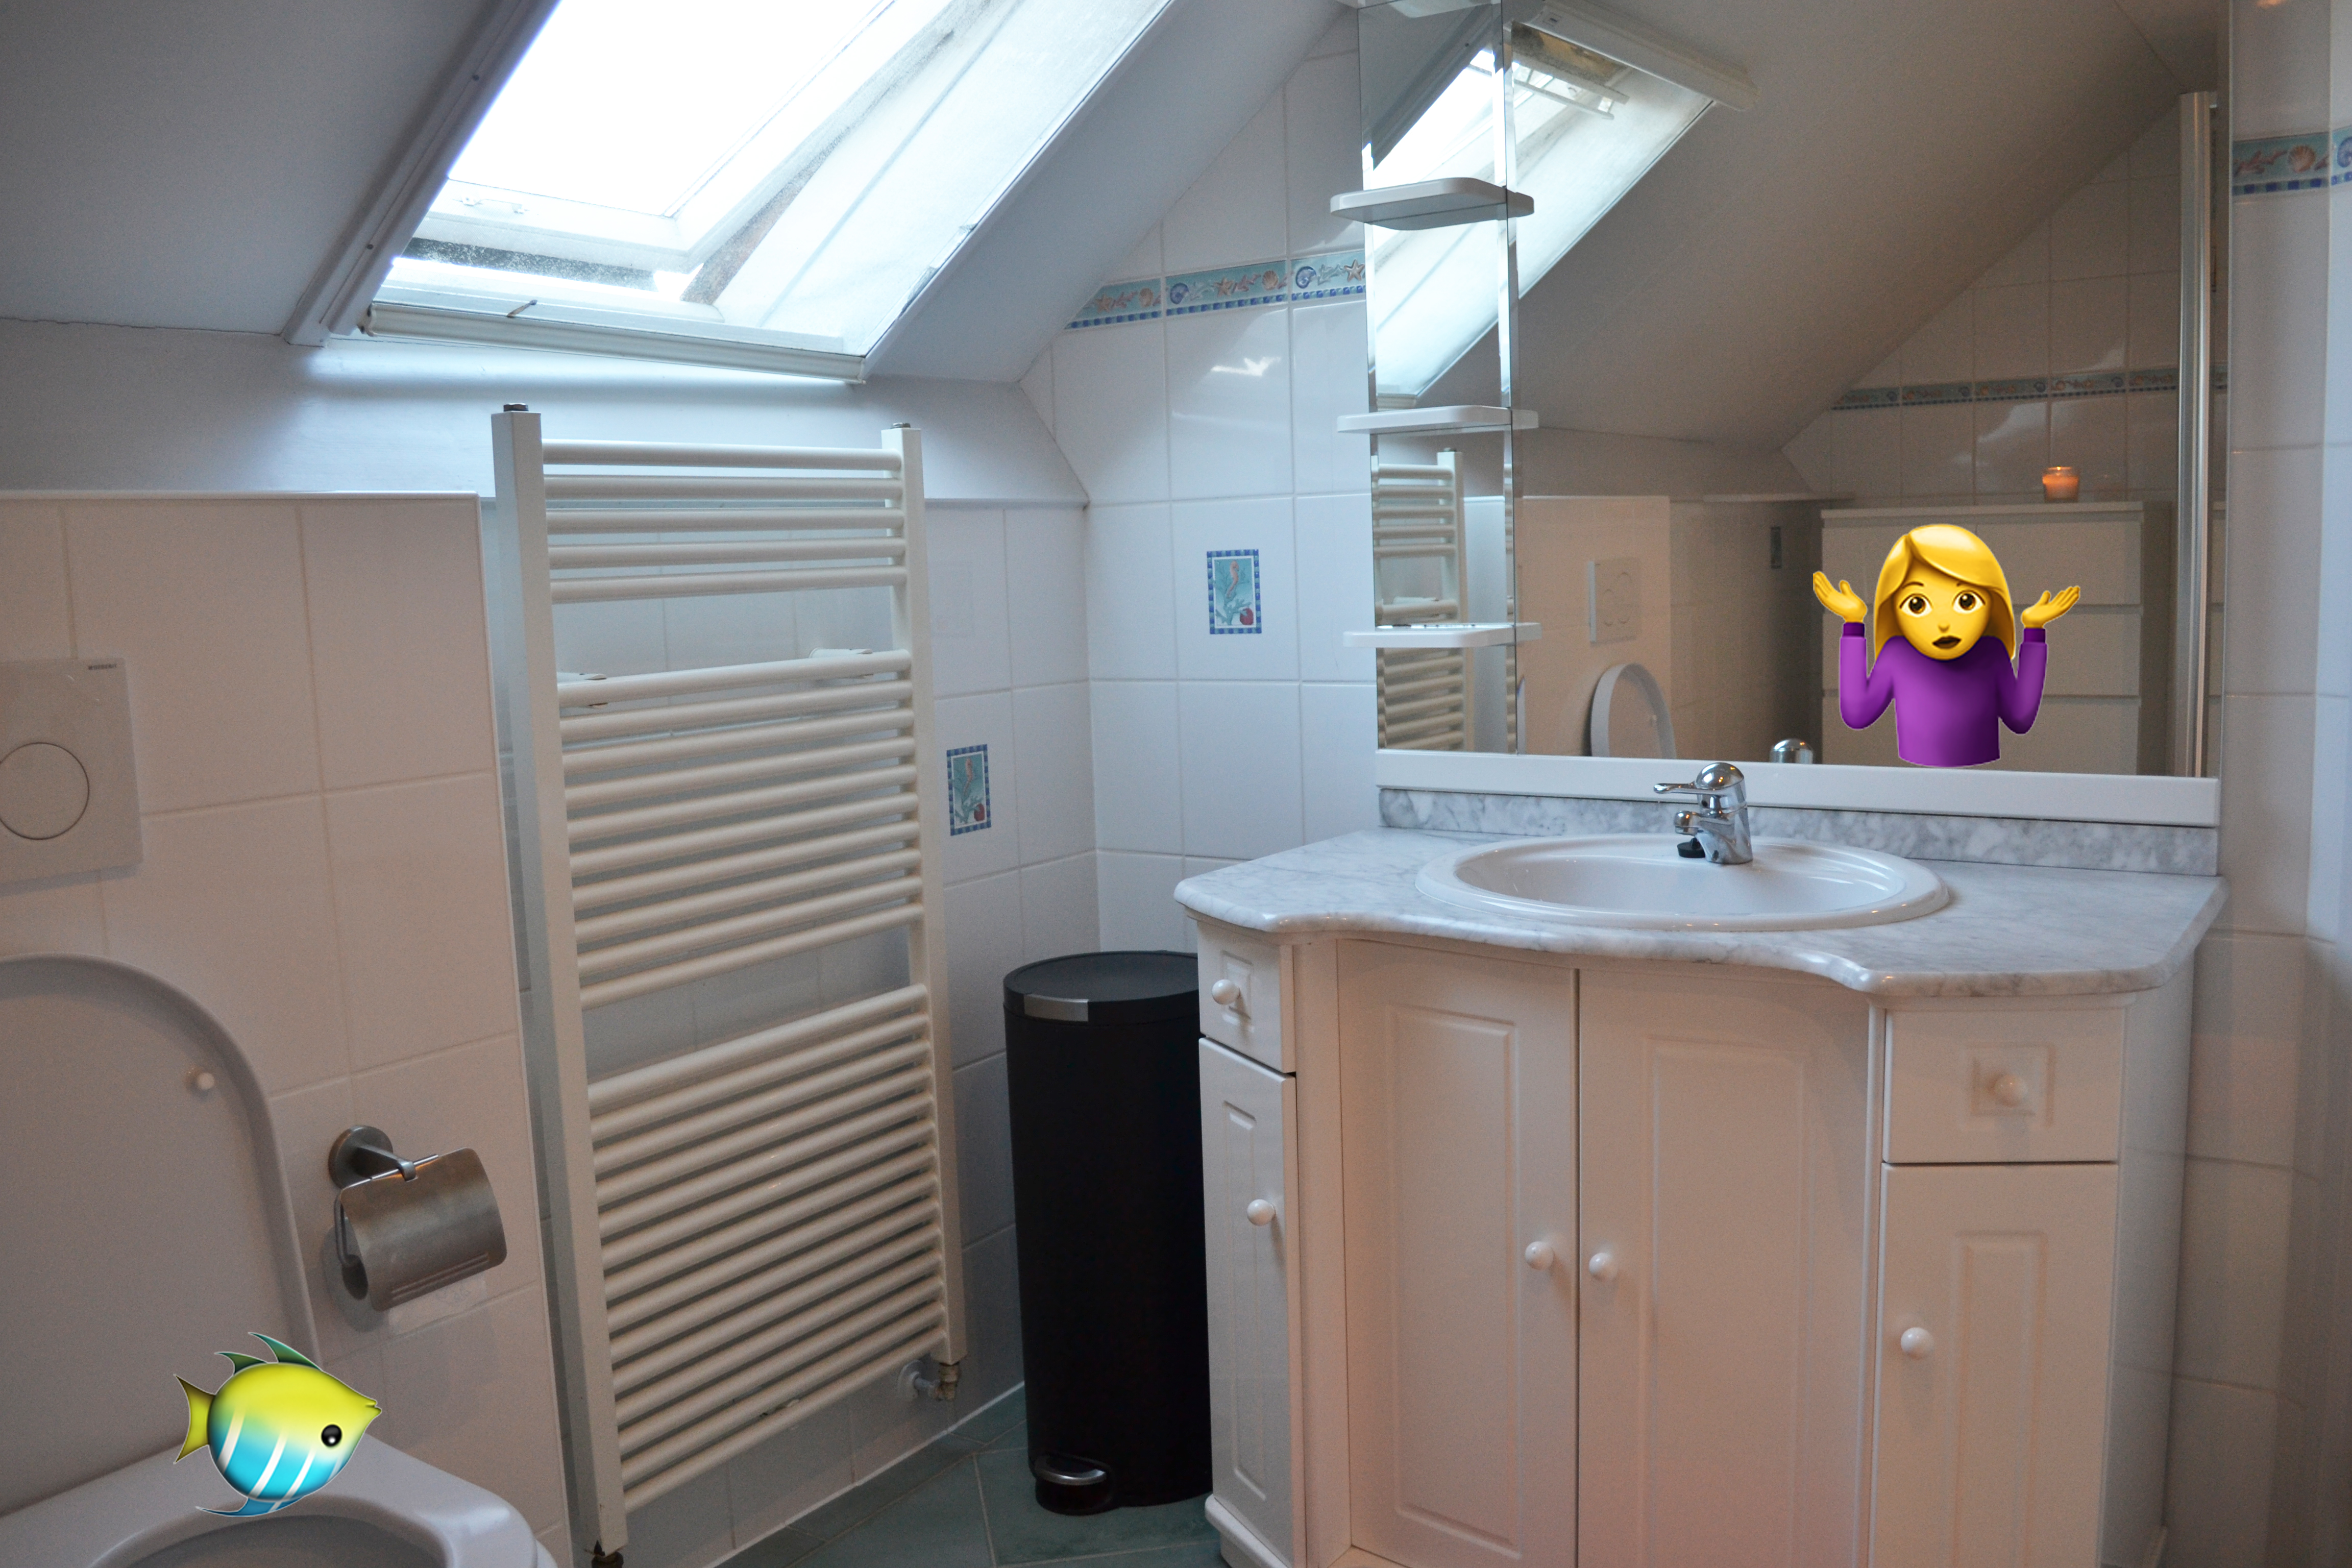 Nieuwe Badkamer Poetsen : Meer zelfliefde in je badkamer u2014 freelennse